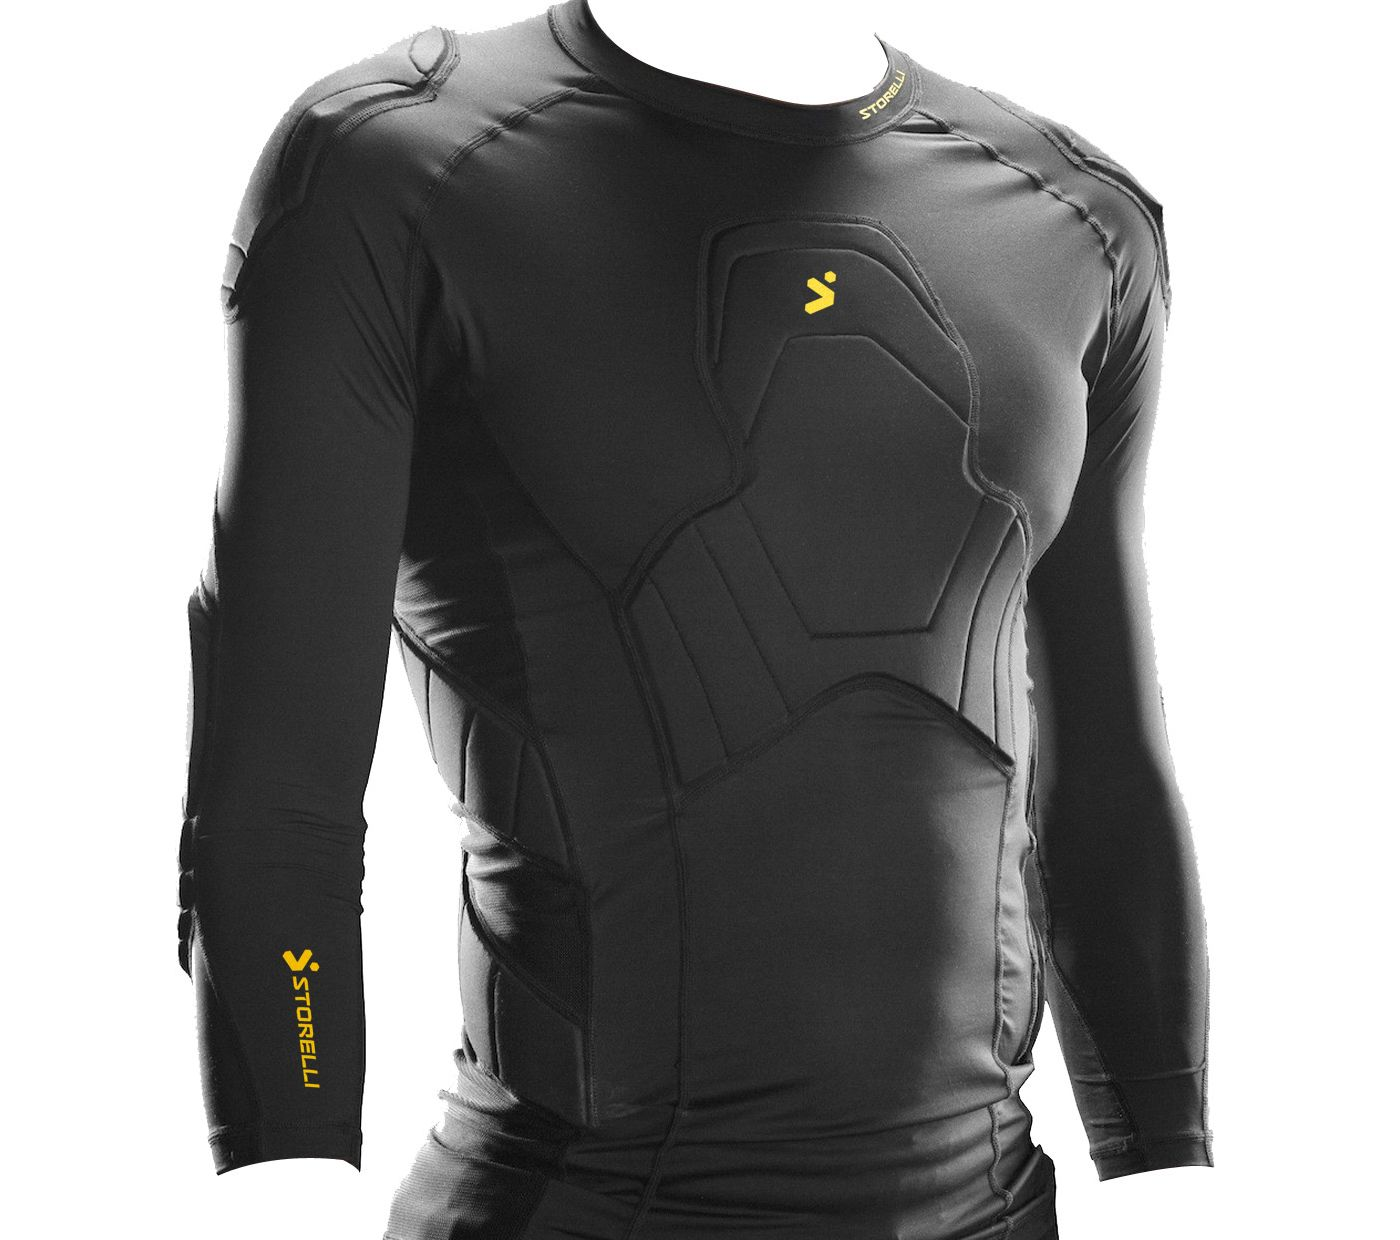 Storelli BodyShield Ultimate Protection GK Shirt